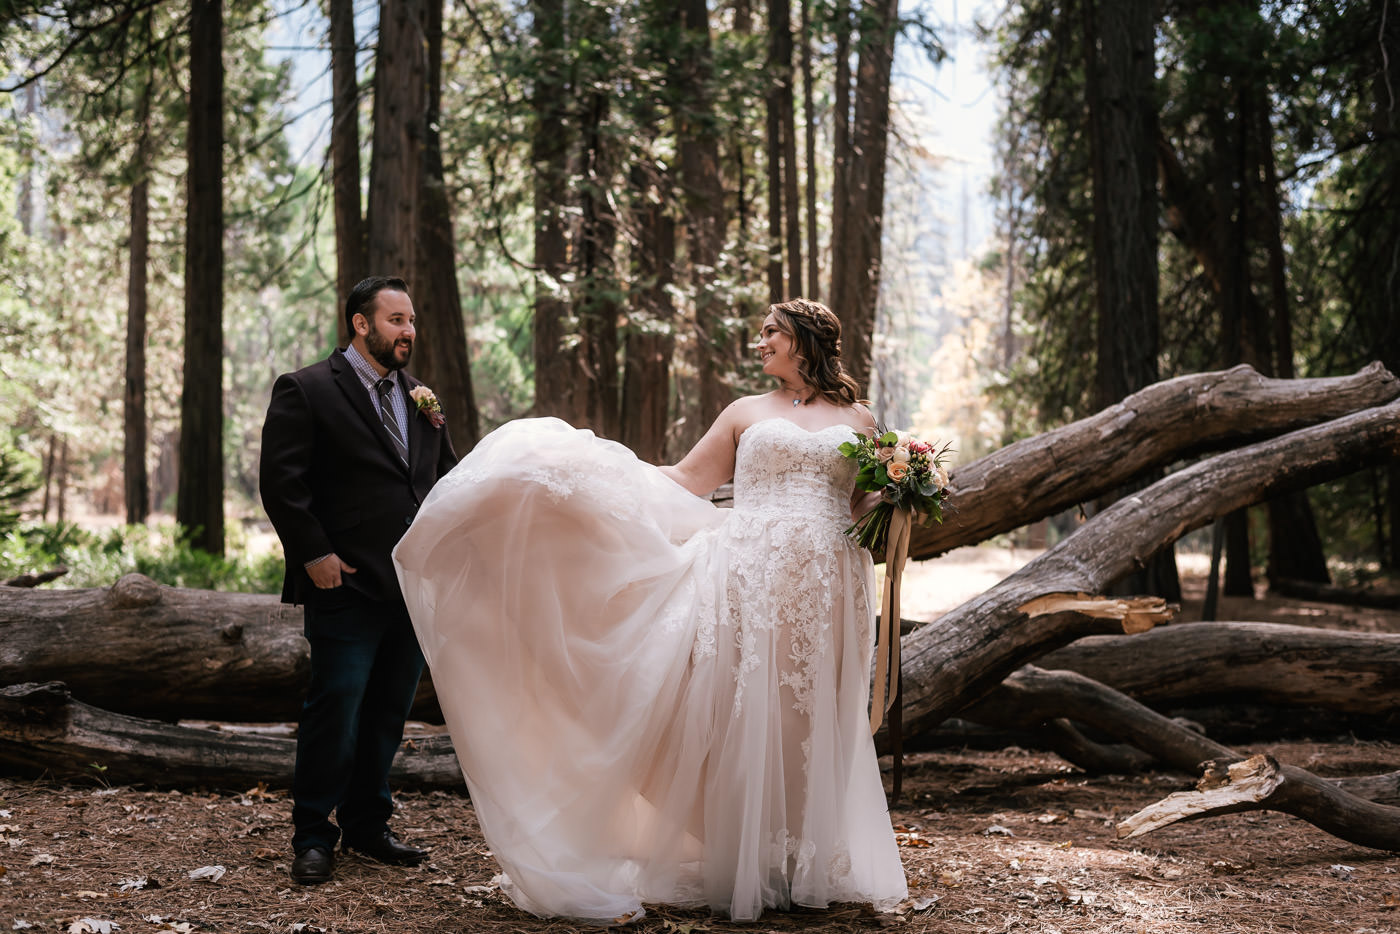 yosemite-swinging-bridge-first-look-wedding-13.jpg